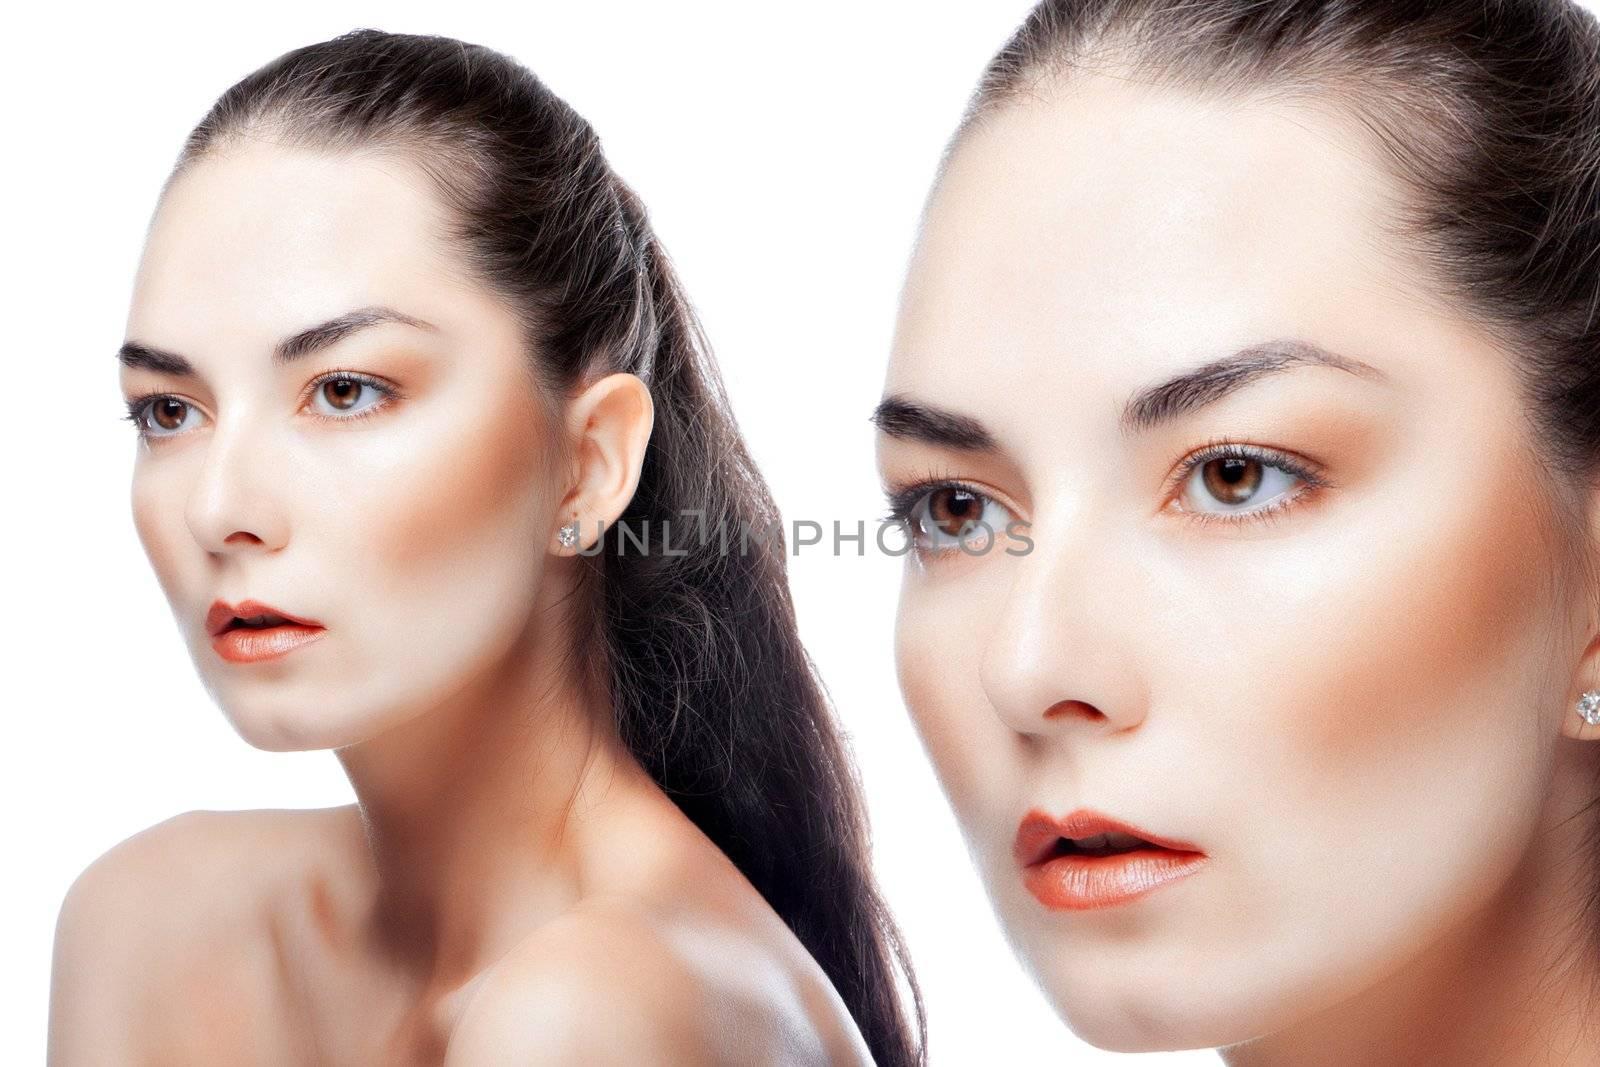 beauty portrait of a woman on a light background.